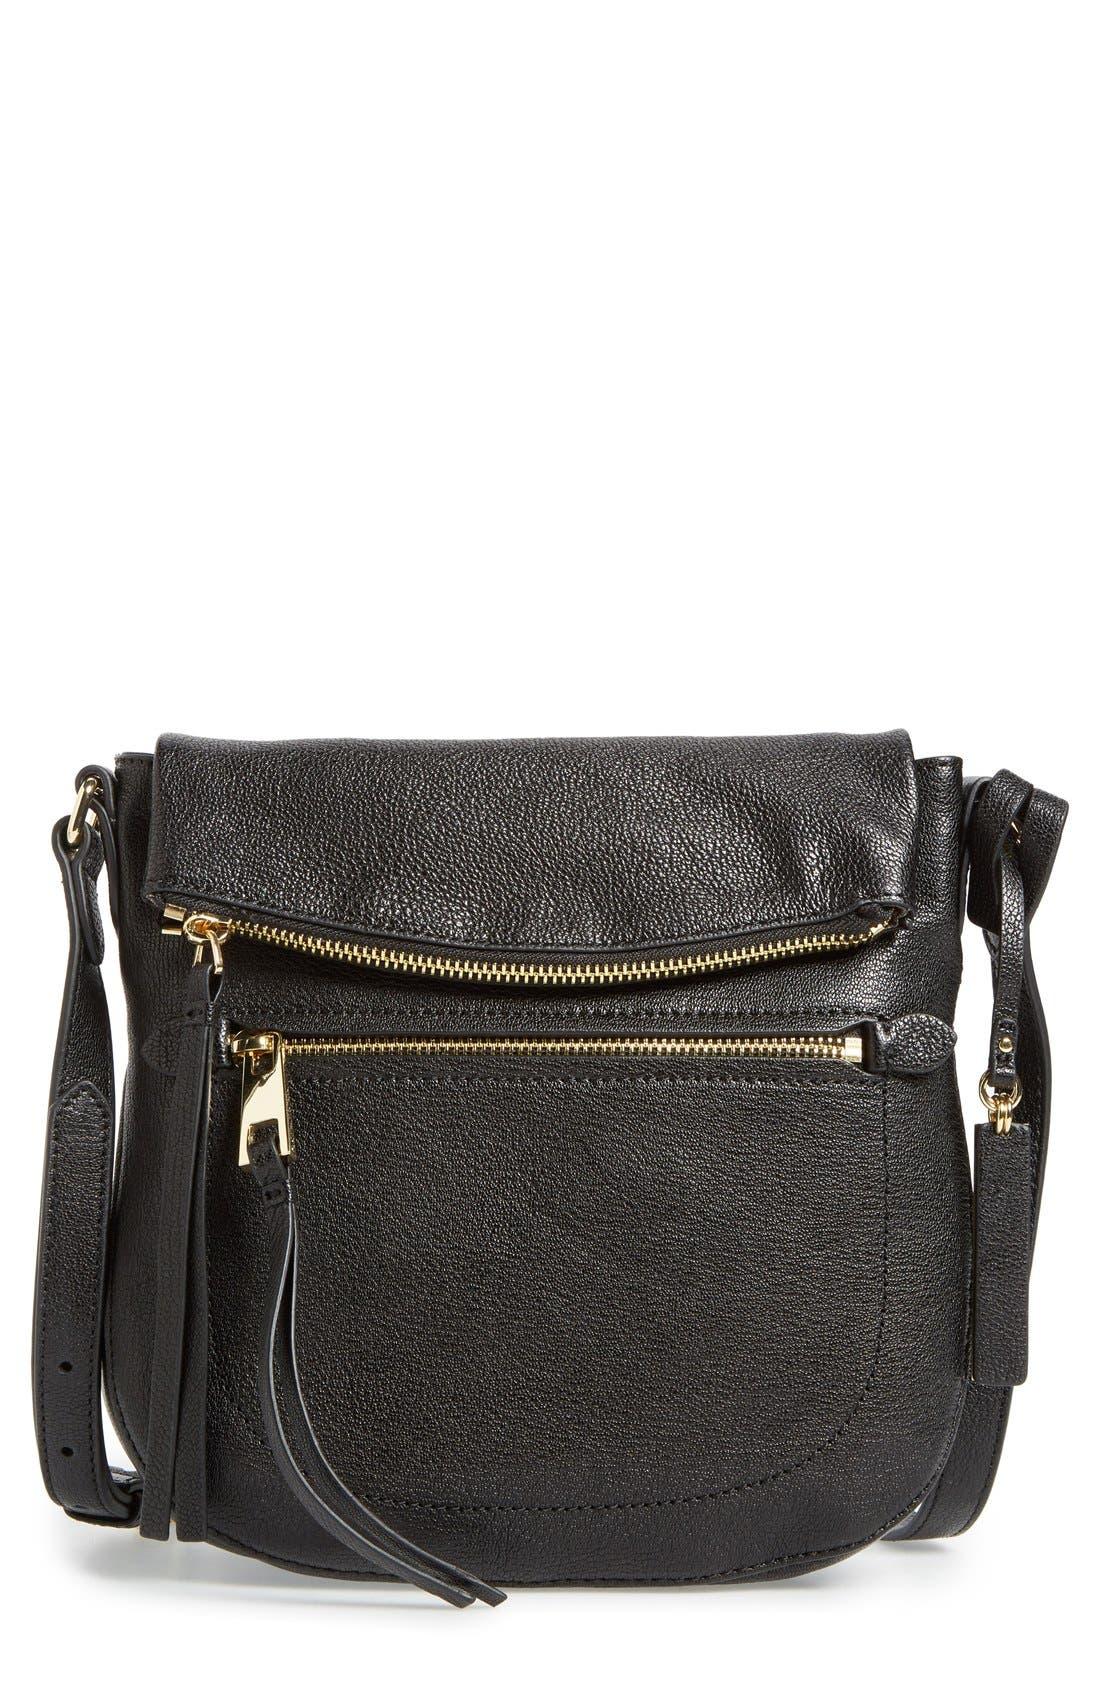 'Tala' Leather Crossbody Bag,                             Main thumbnail 1, color,                             001